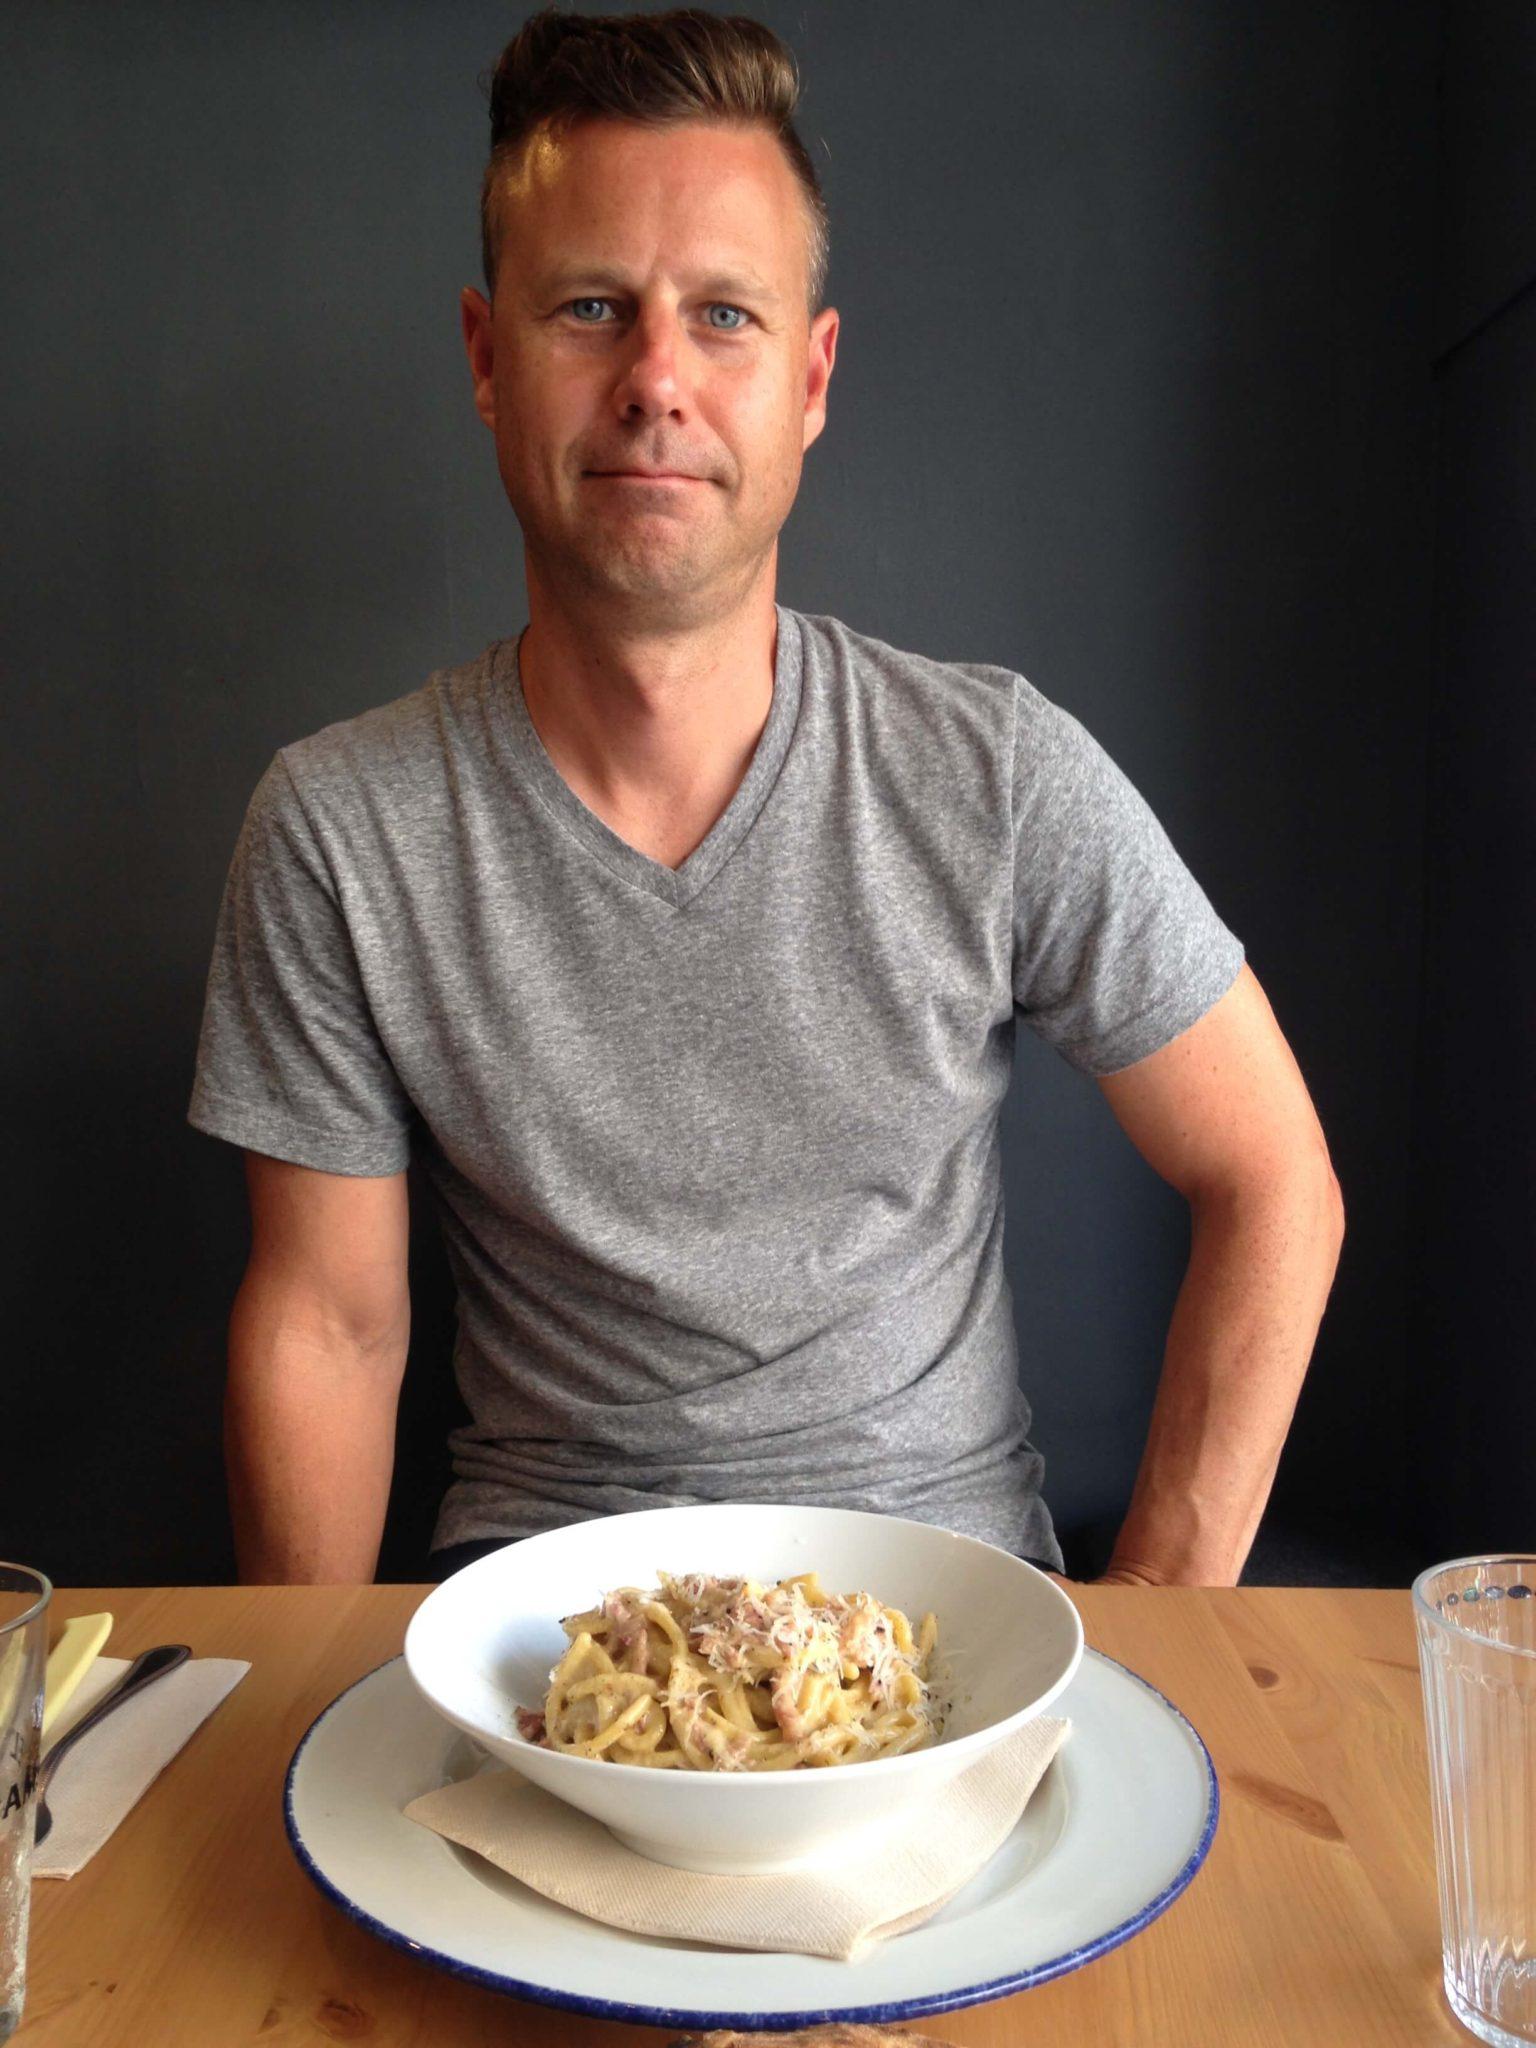 jeremy eating pasta